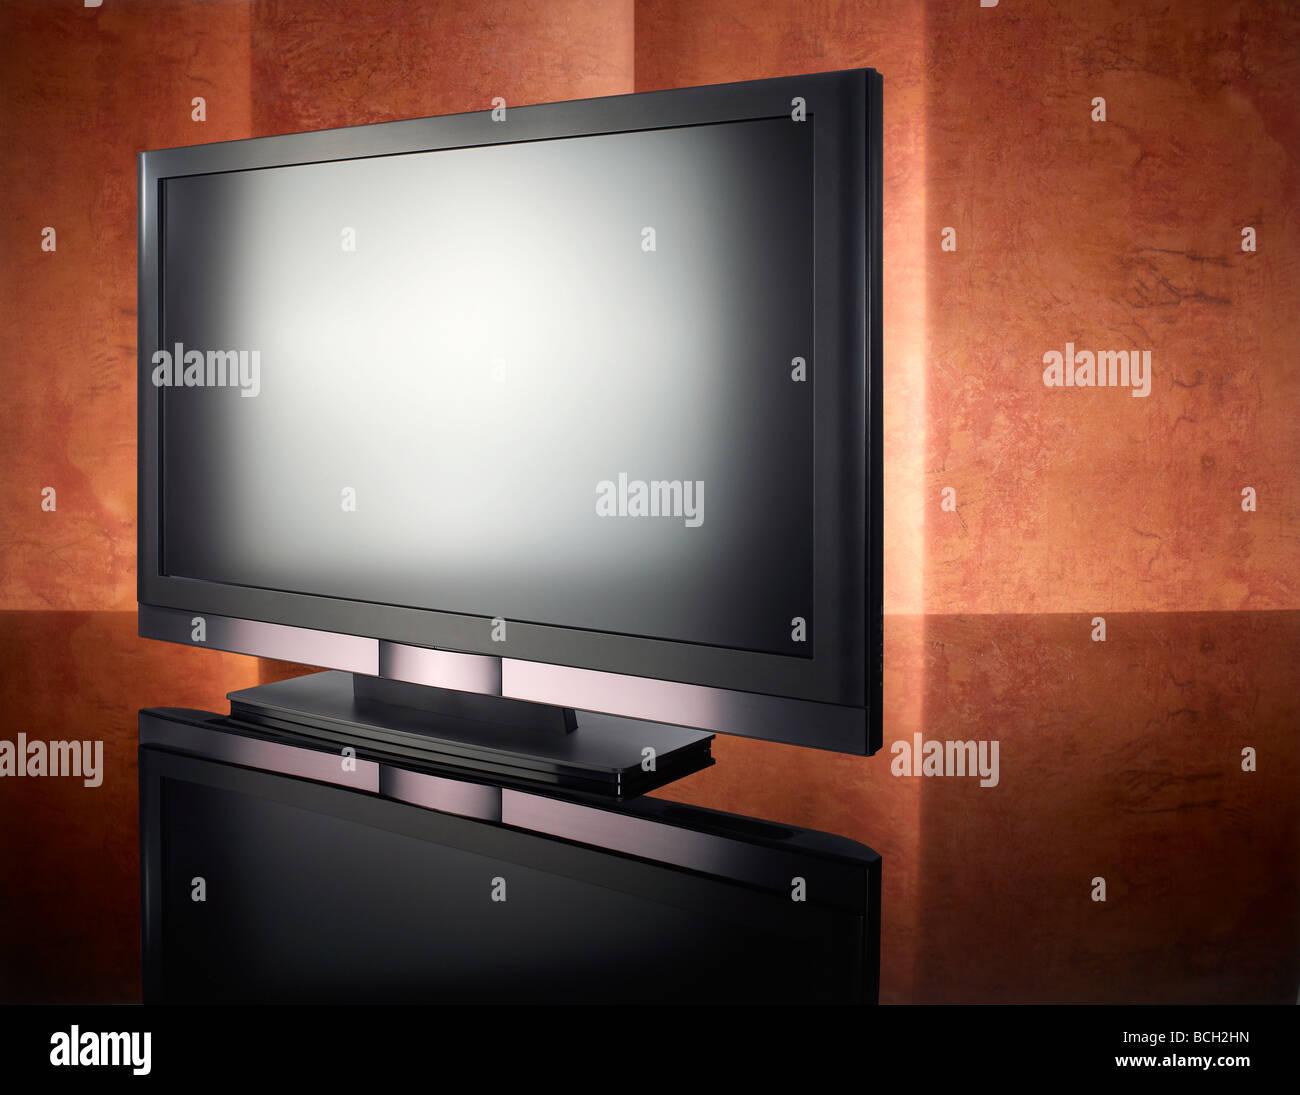 Ongebruikt Plasma Stockfotos & Plasma Bilder - Alamy PL-89